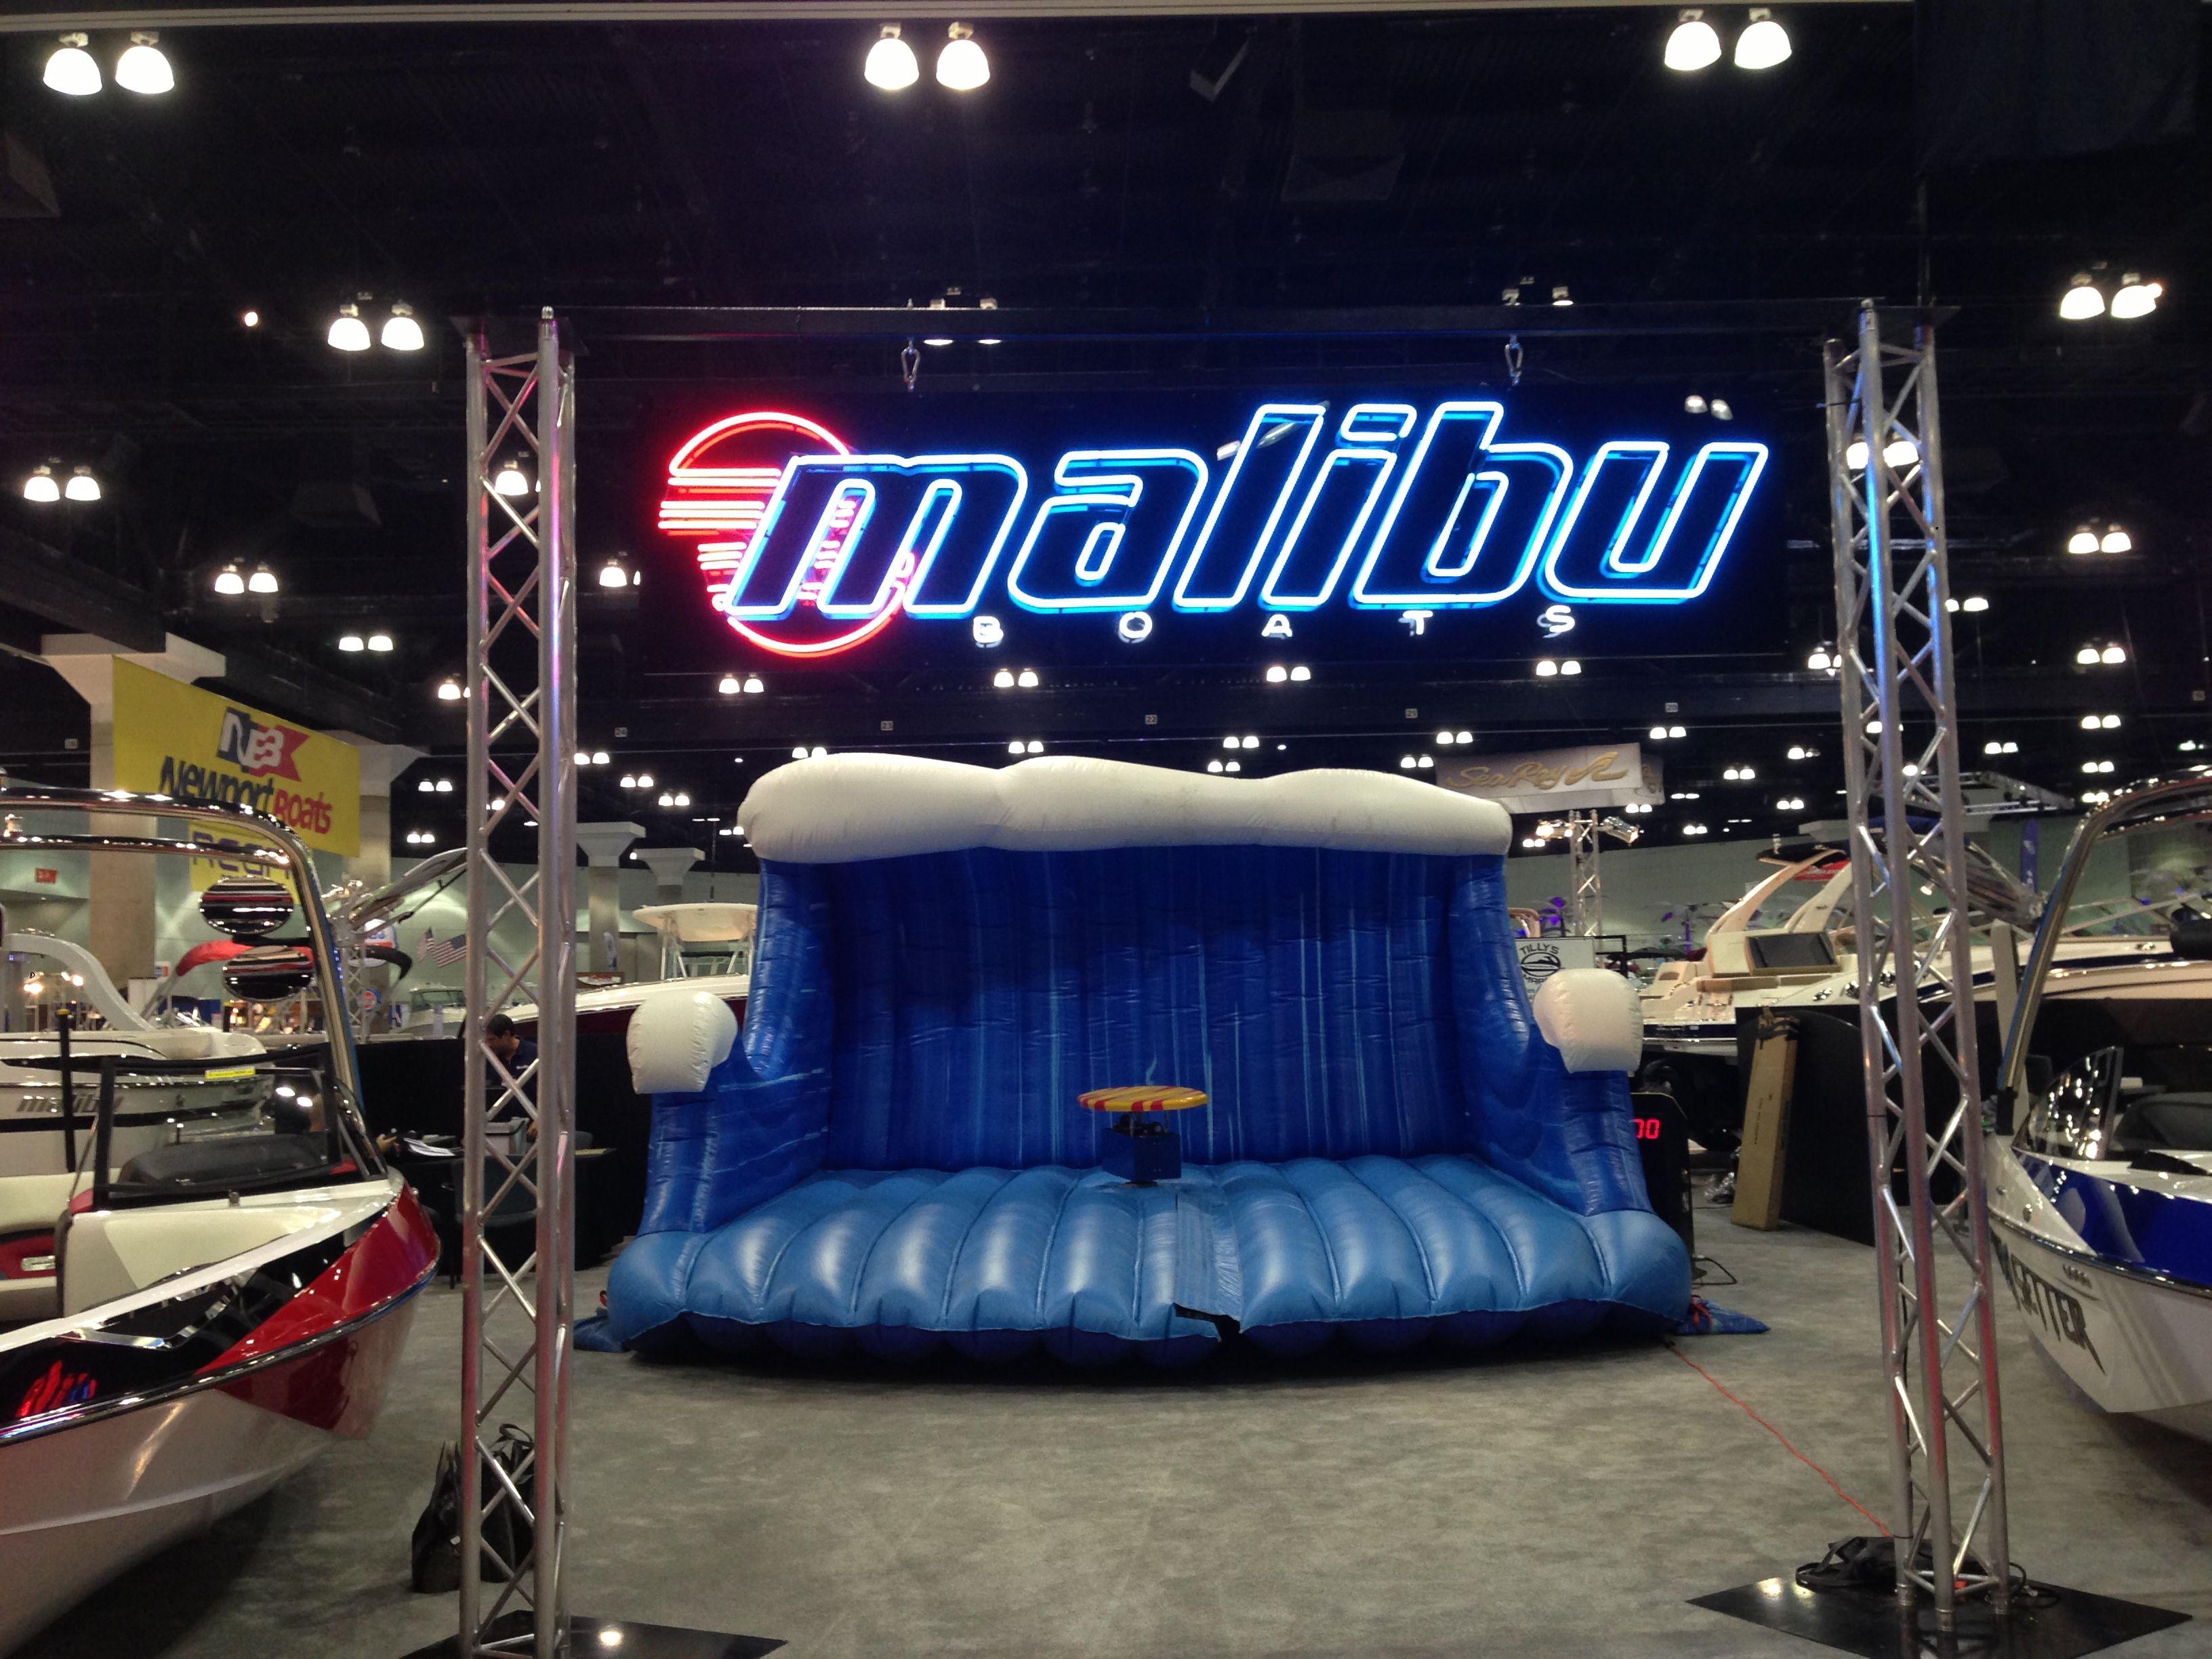 Mechanical rides mechanical bull surfboard simulator